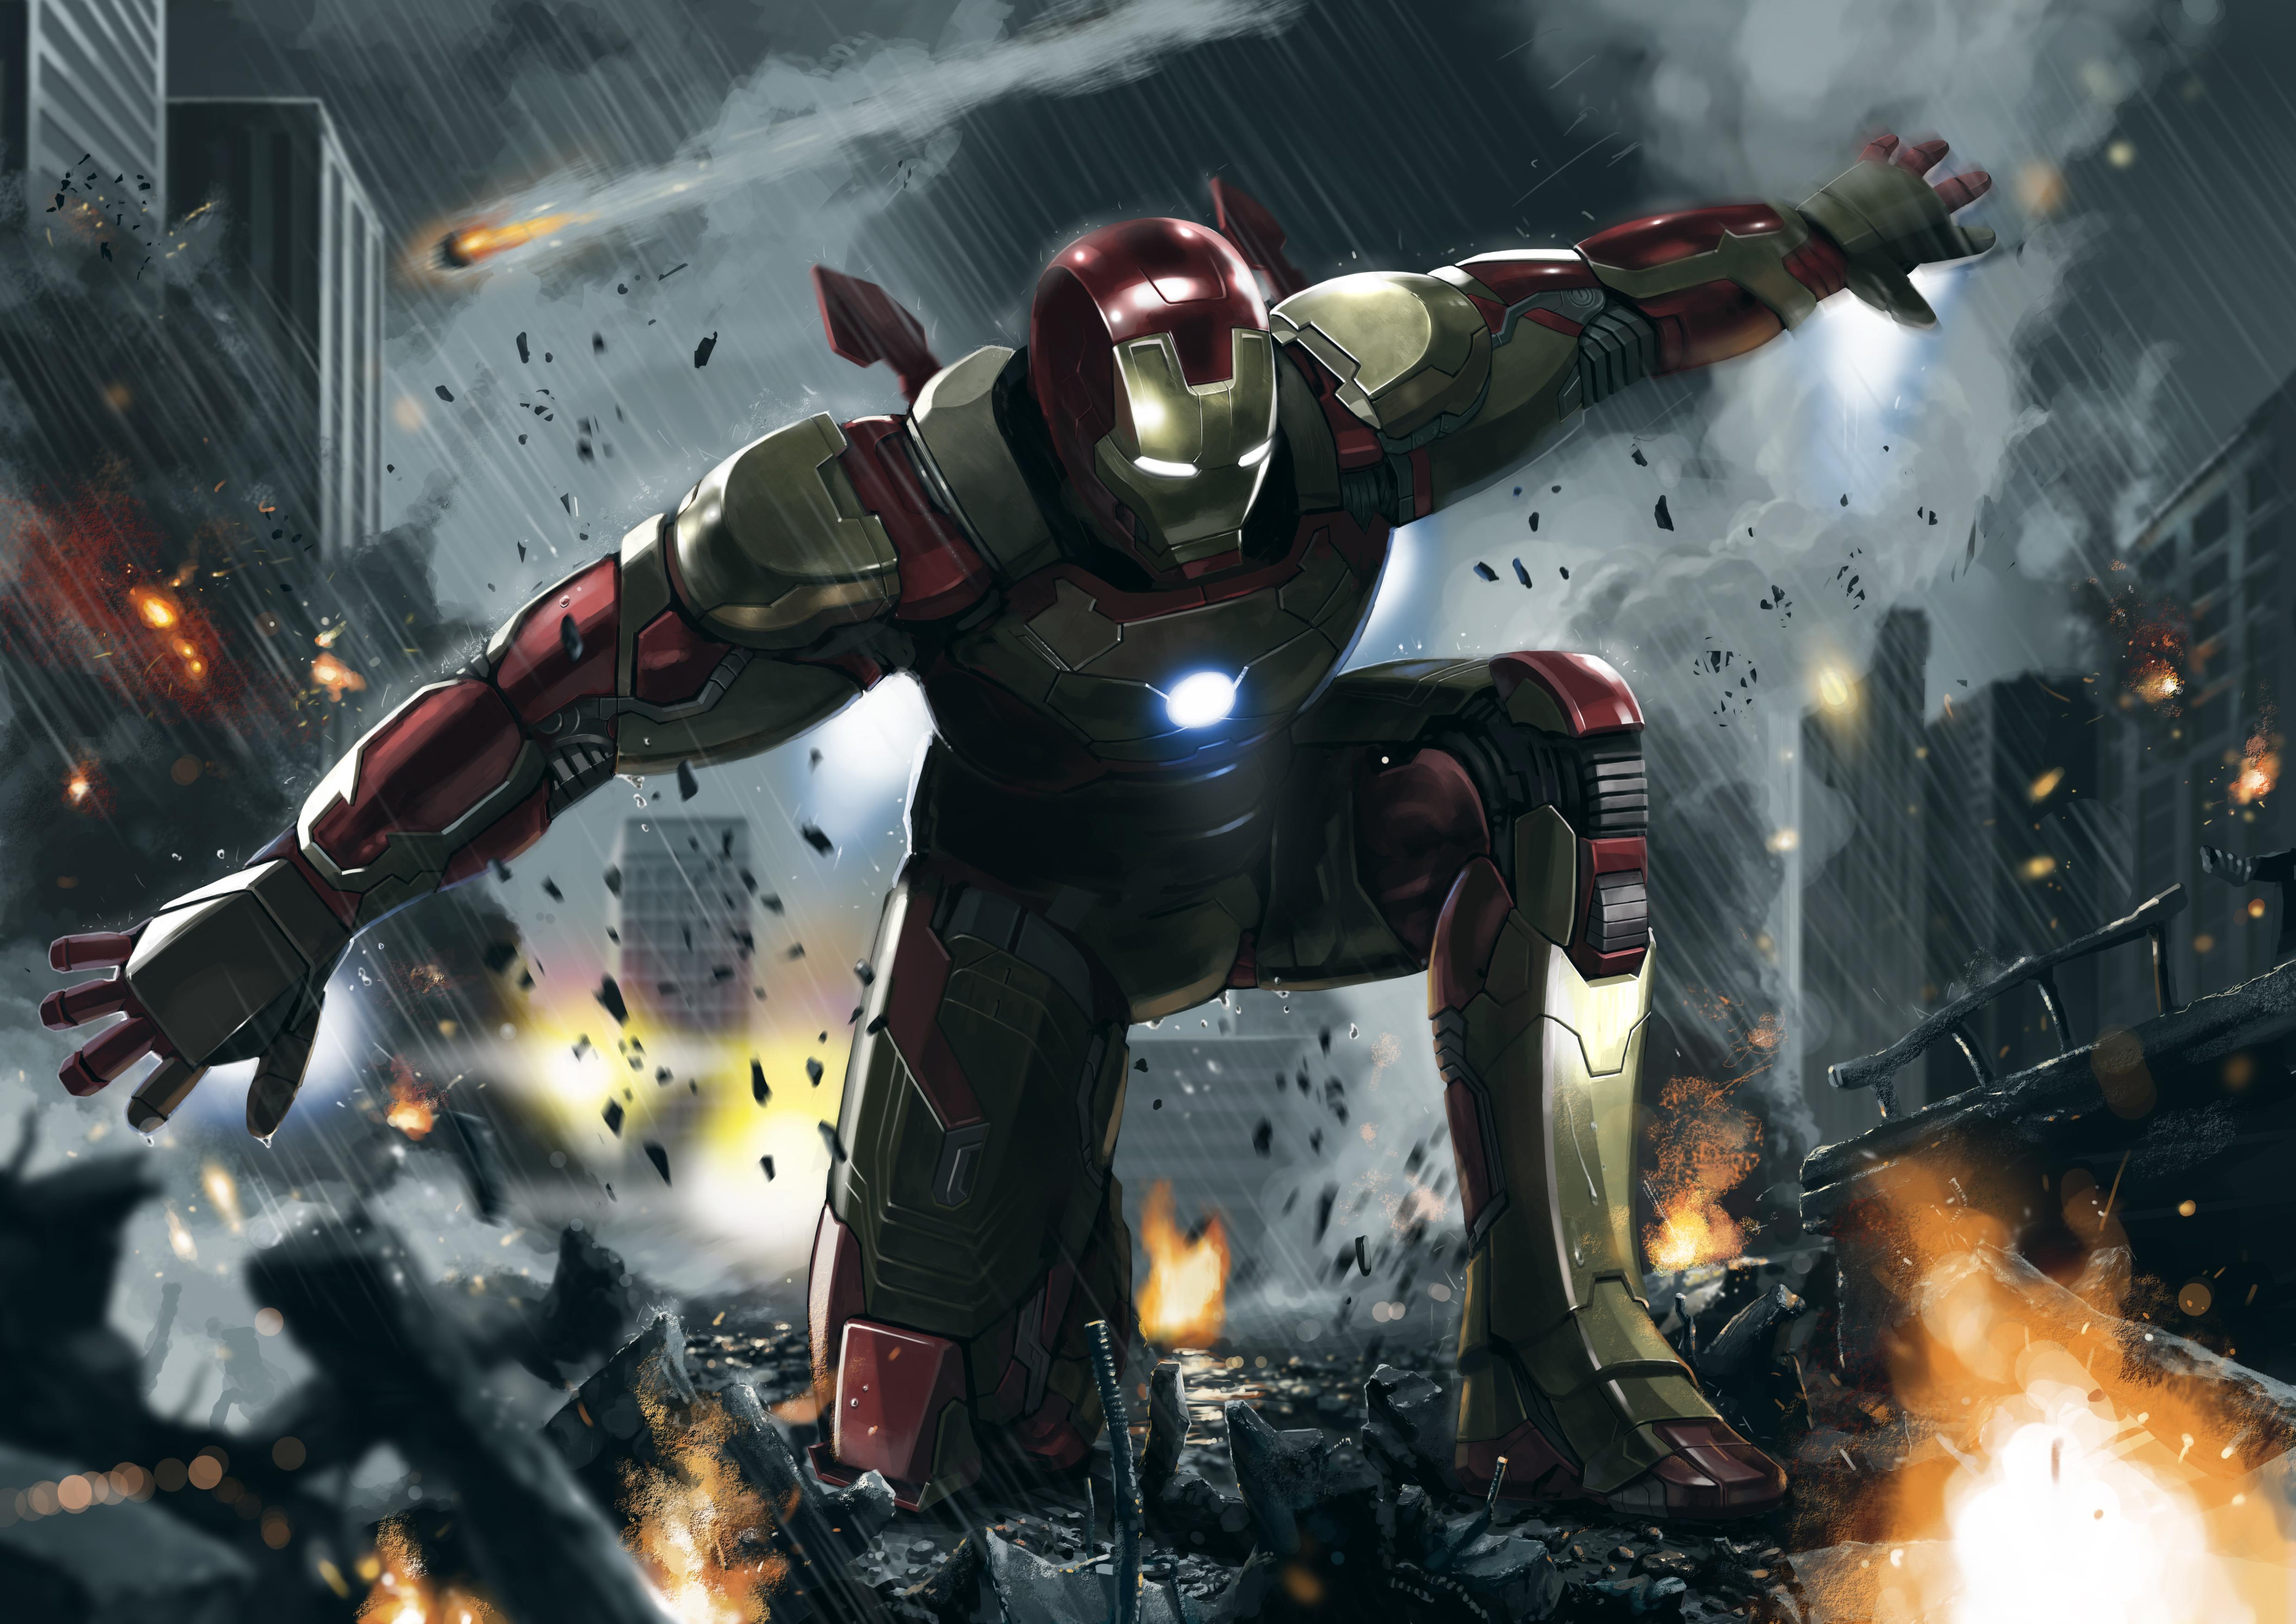 Iron Man 3 Art 4k, HD Superheroes, 4k Wallpapers, Images